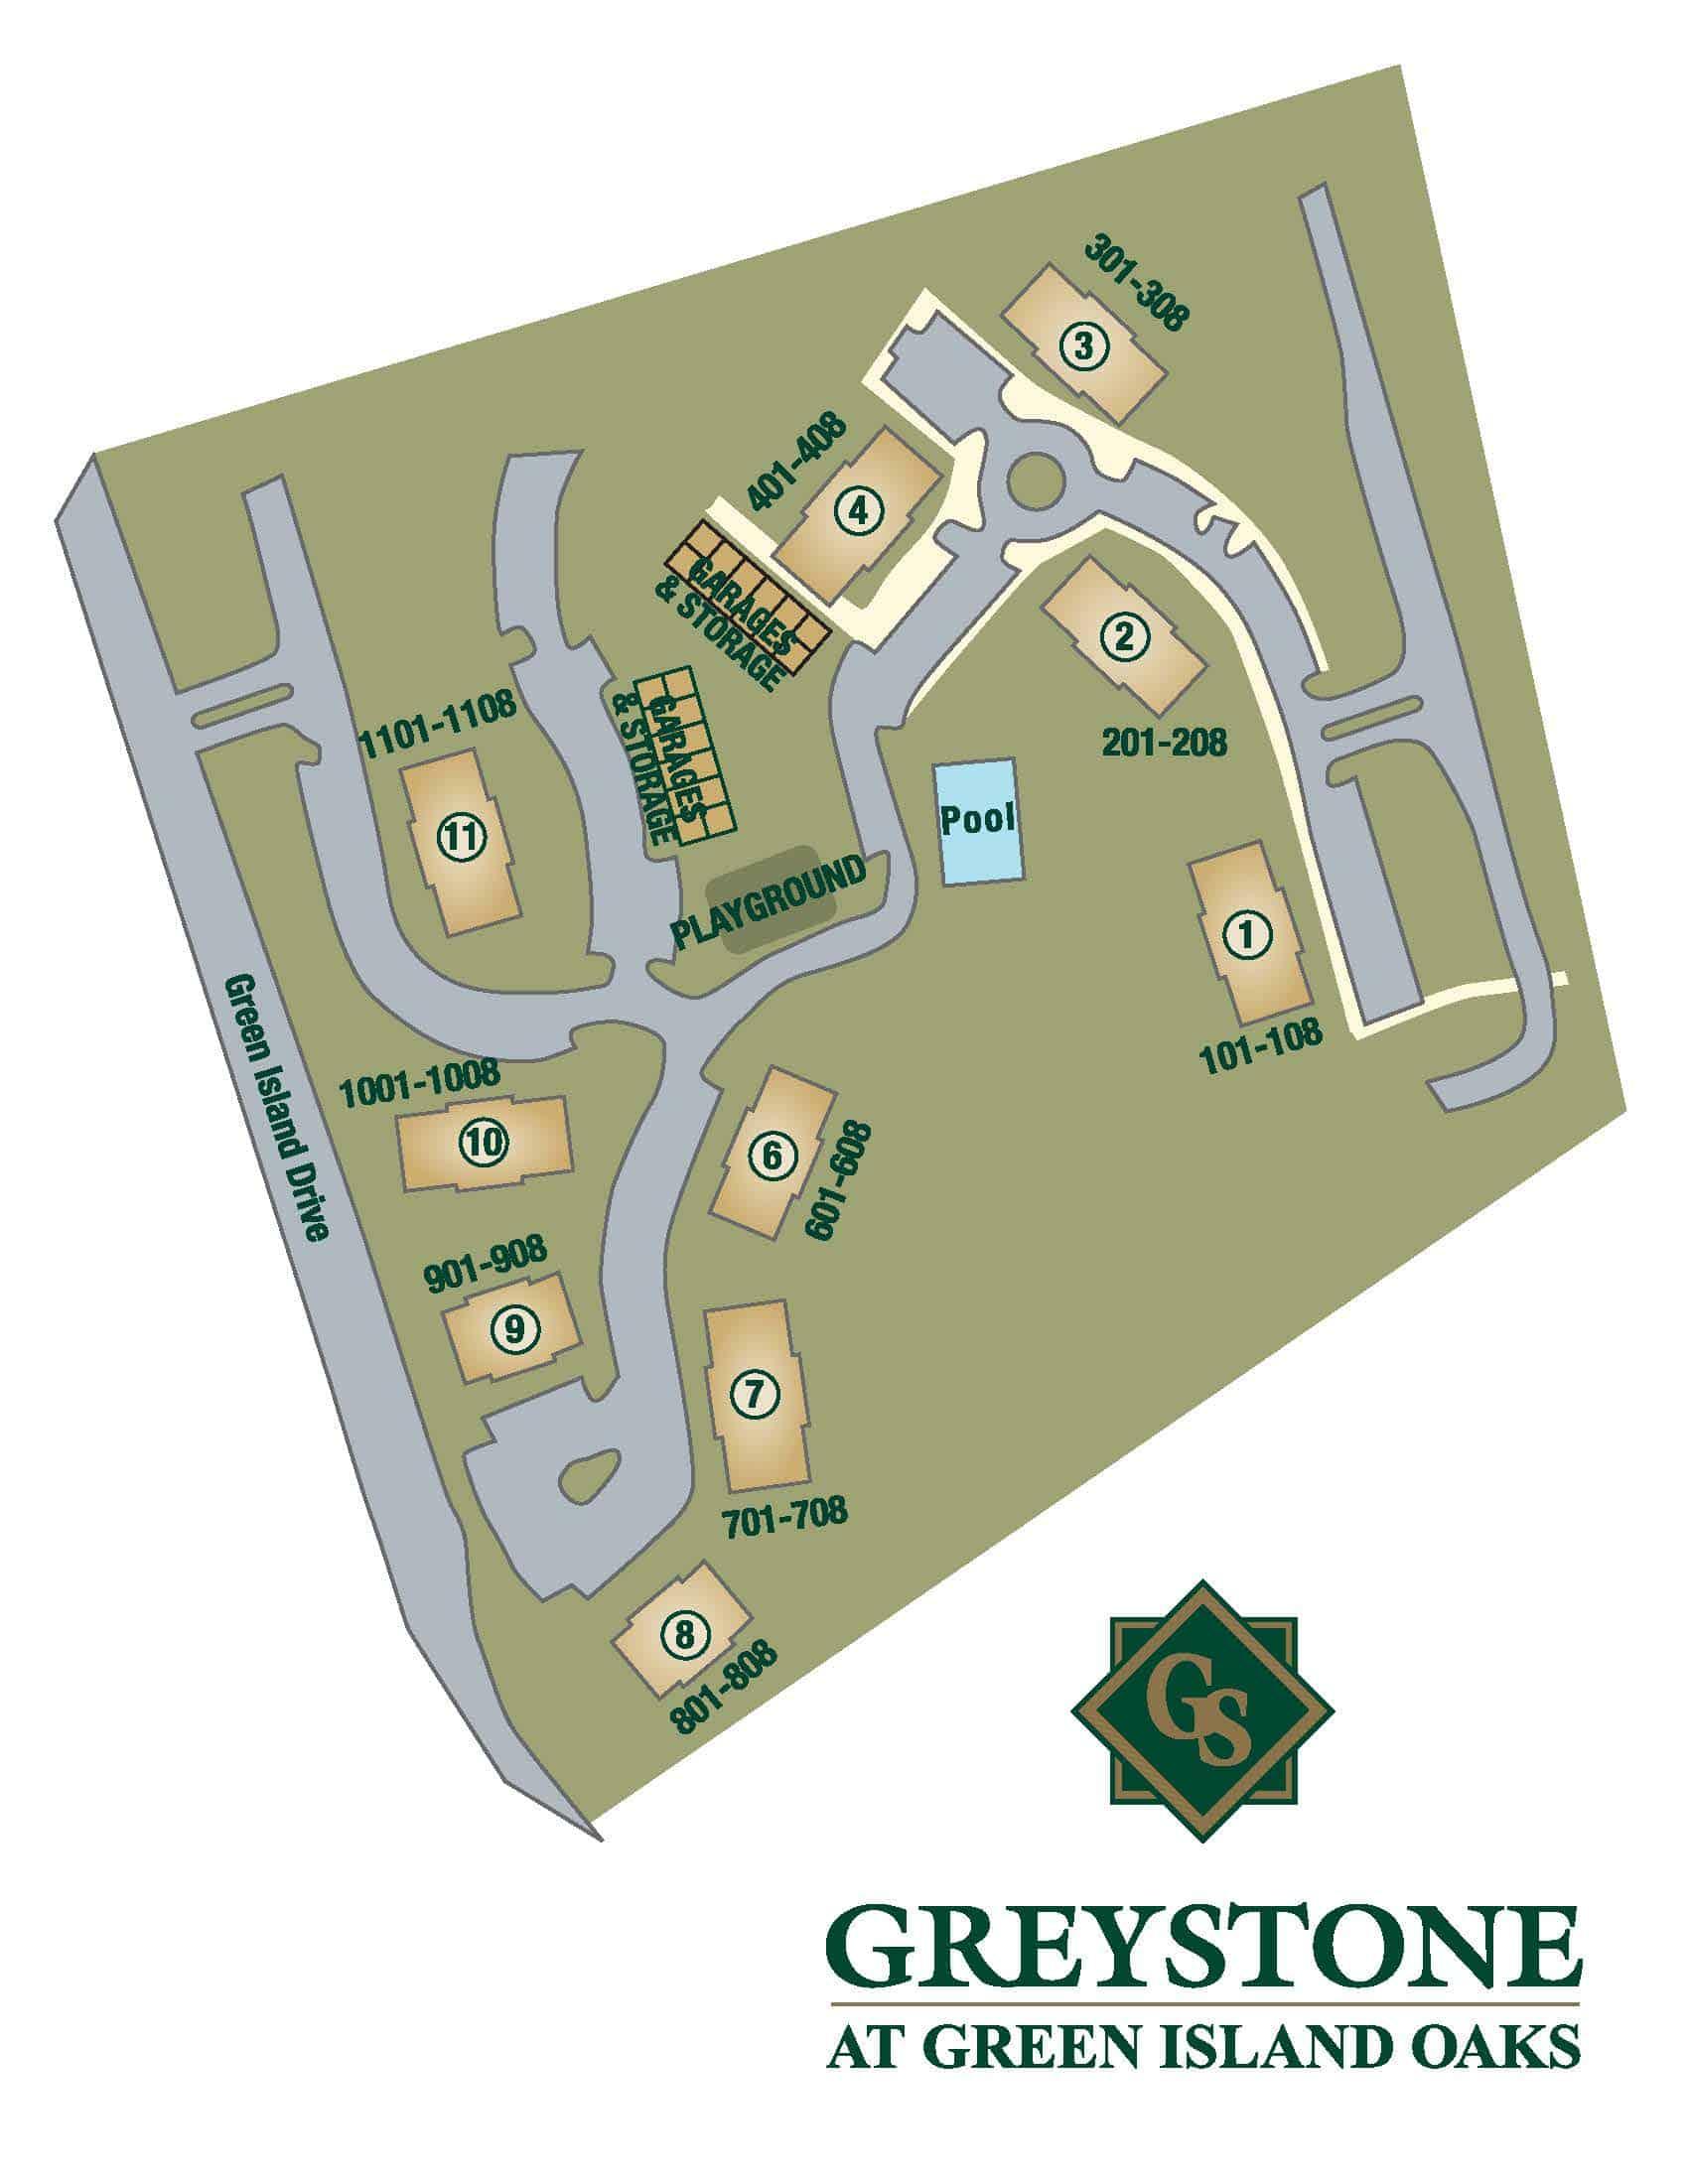 Greystone Properties Green Island Oaks Apartments Columbus, GA Site Plan